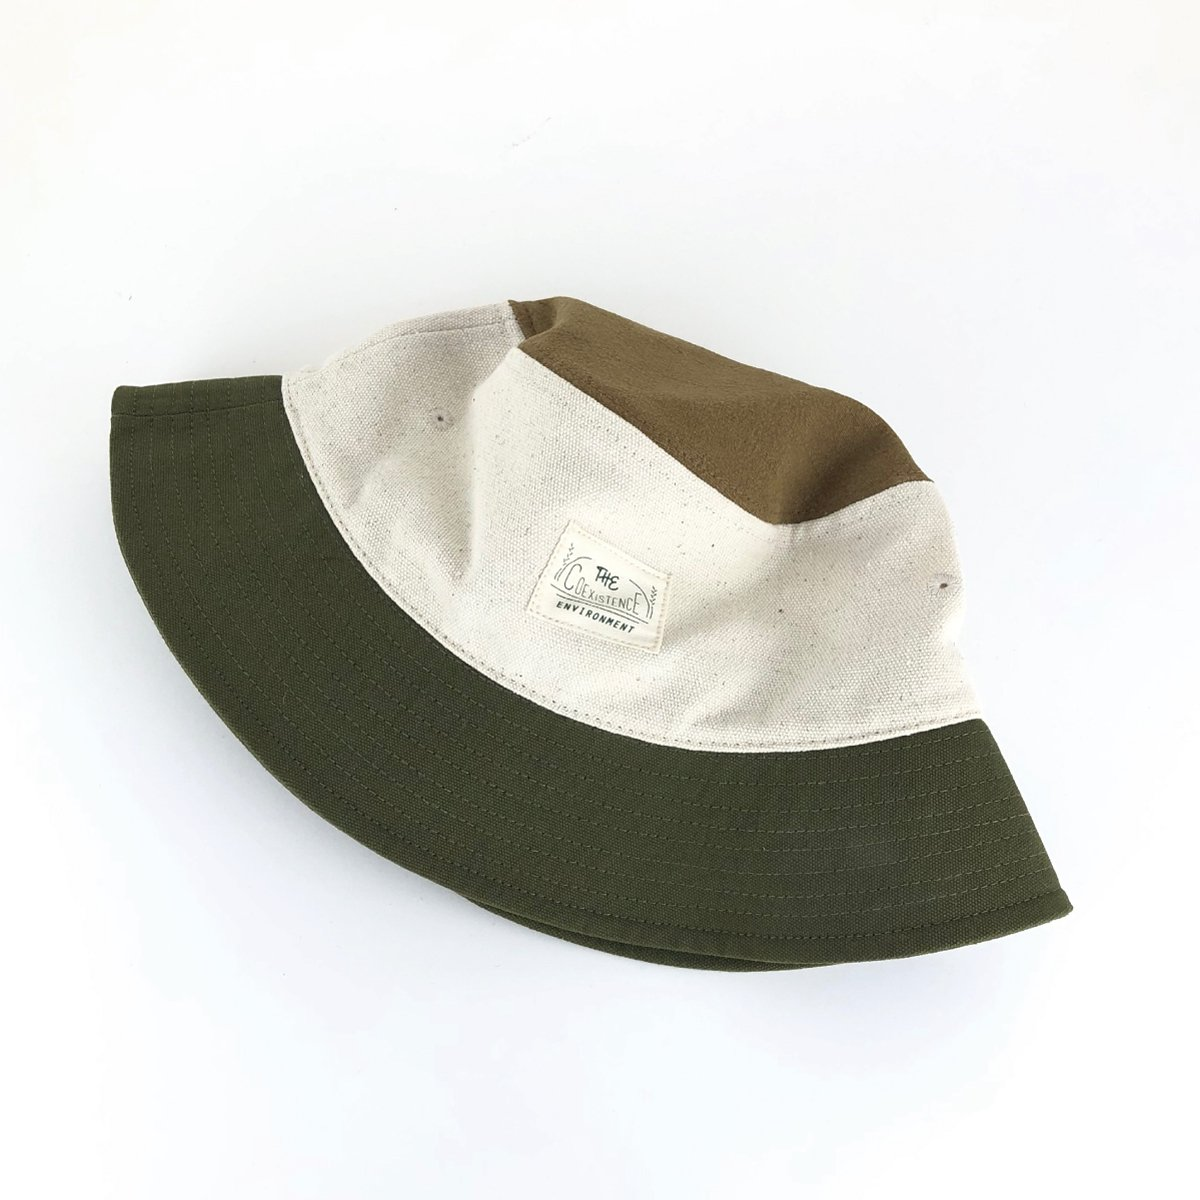 Repro Hat 詳細画像12